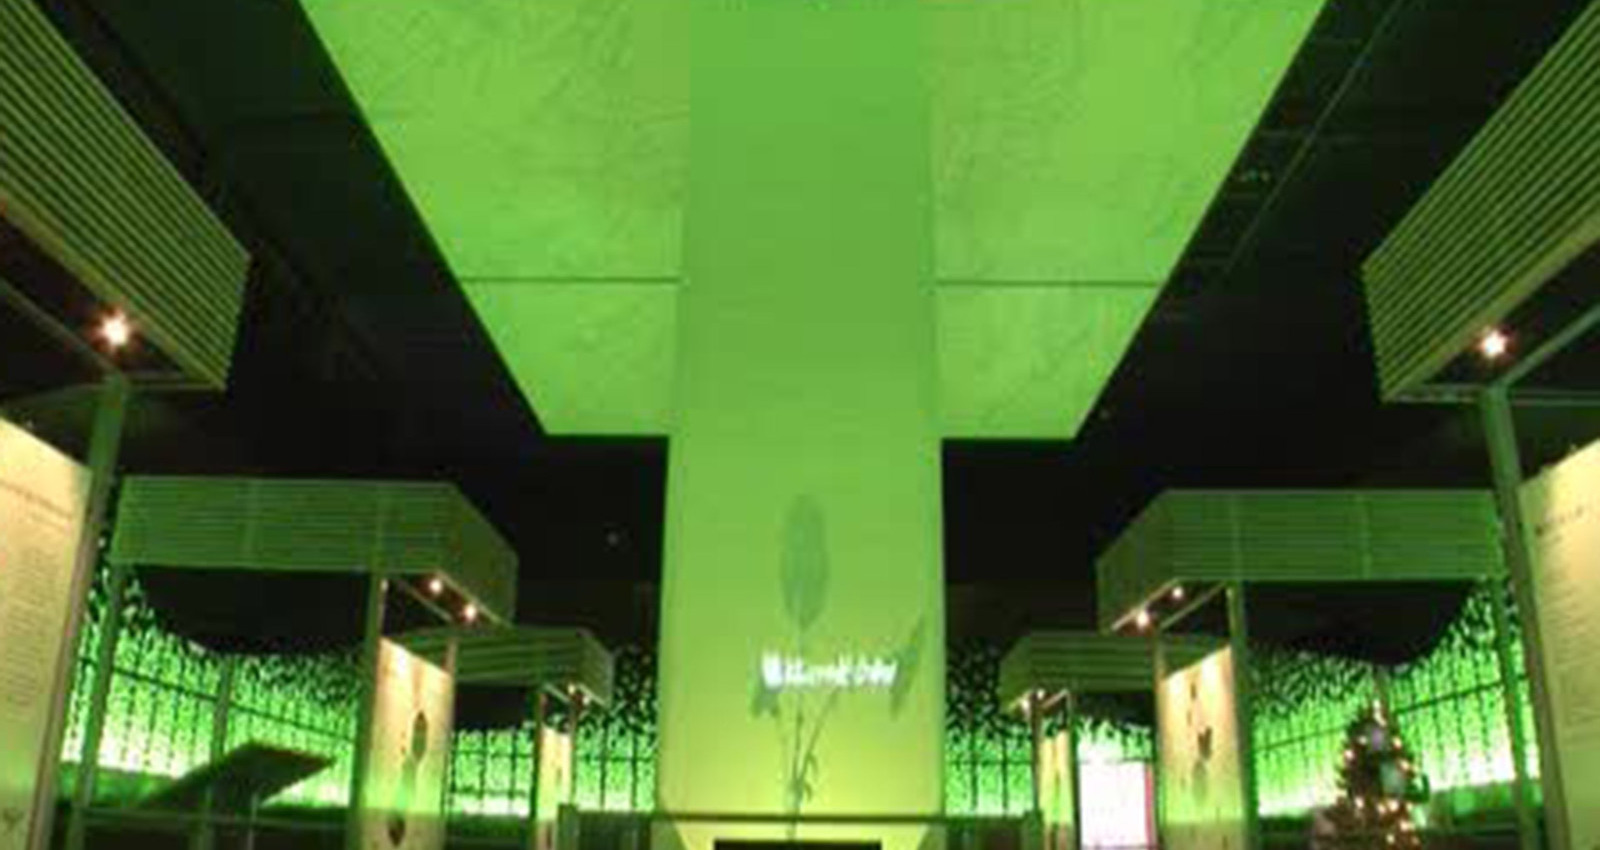 UK Pavilion, Aichi Expo 05, Japan